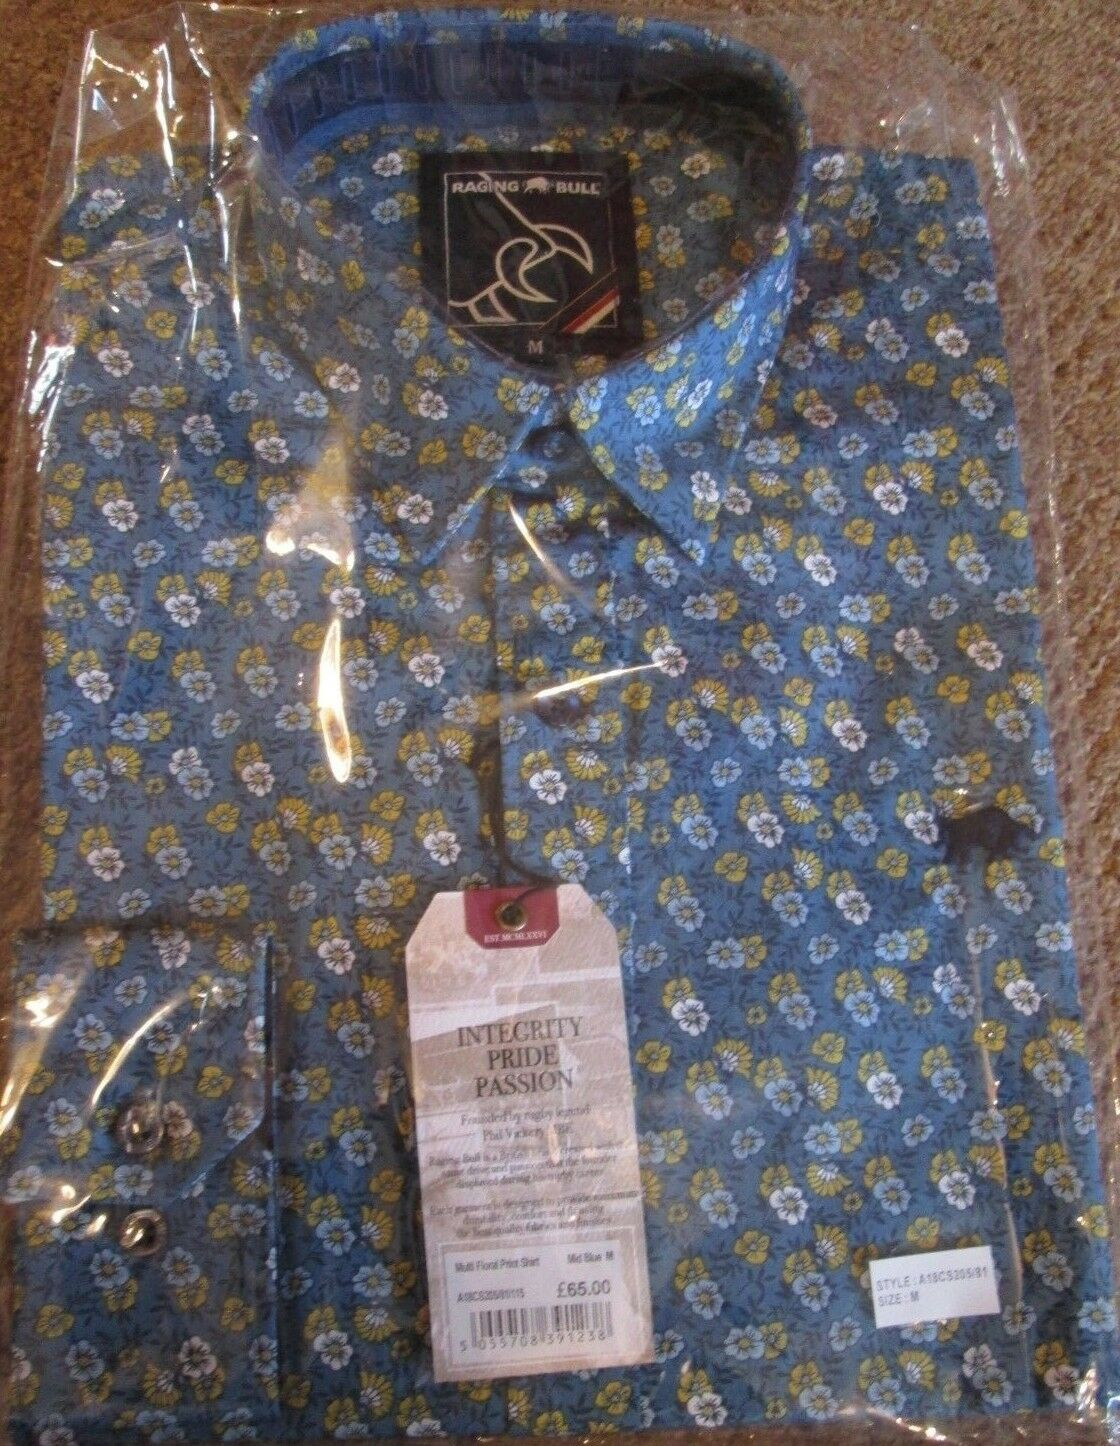 Raging Bull Mens Multi Floral Print Shirt - Mid bluee Size Medium   BNWT RRP